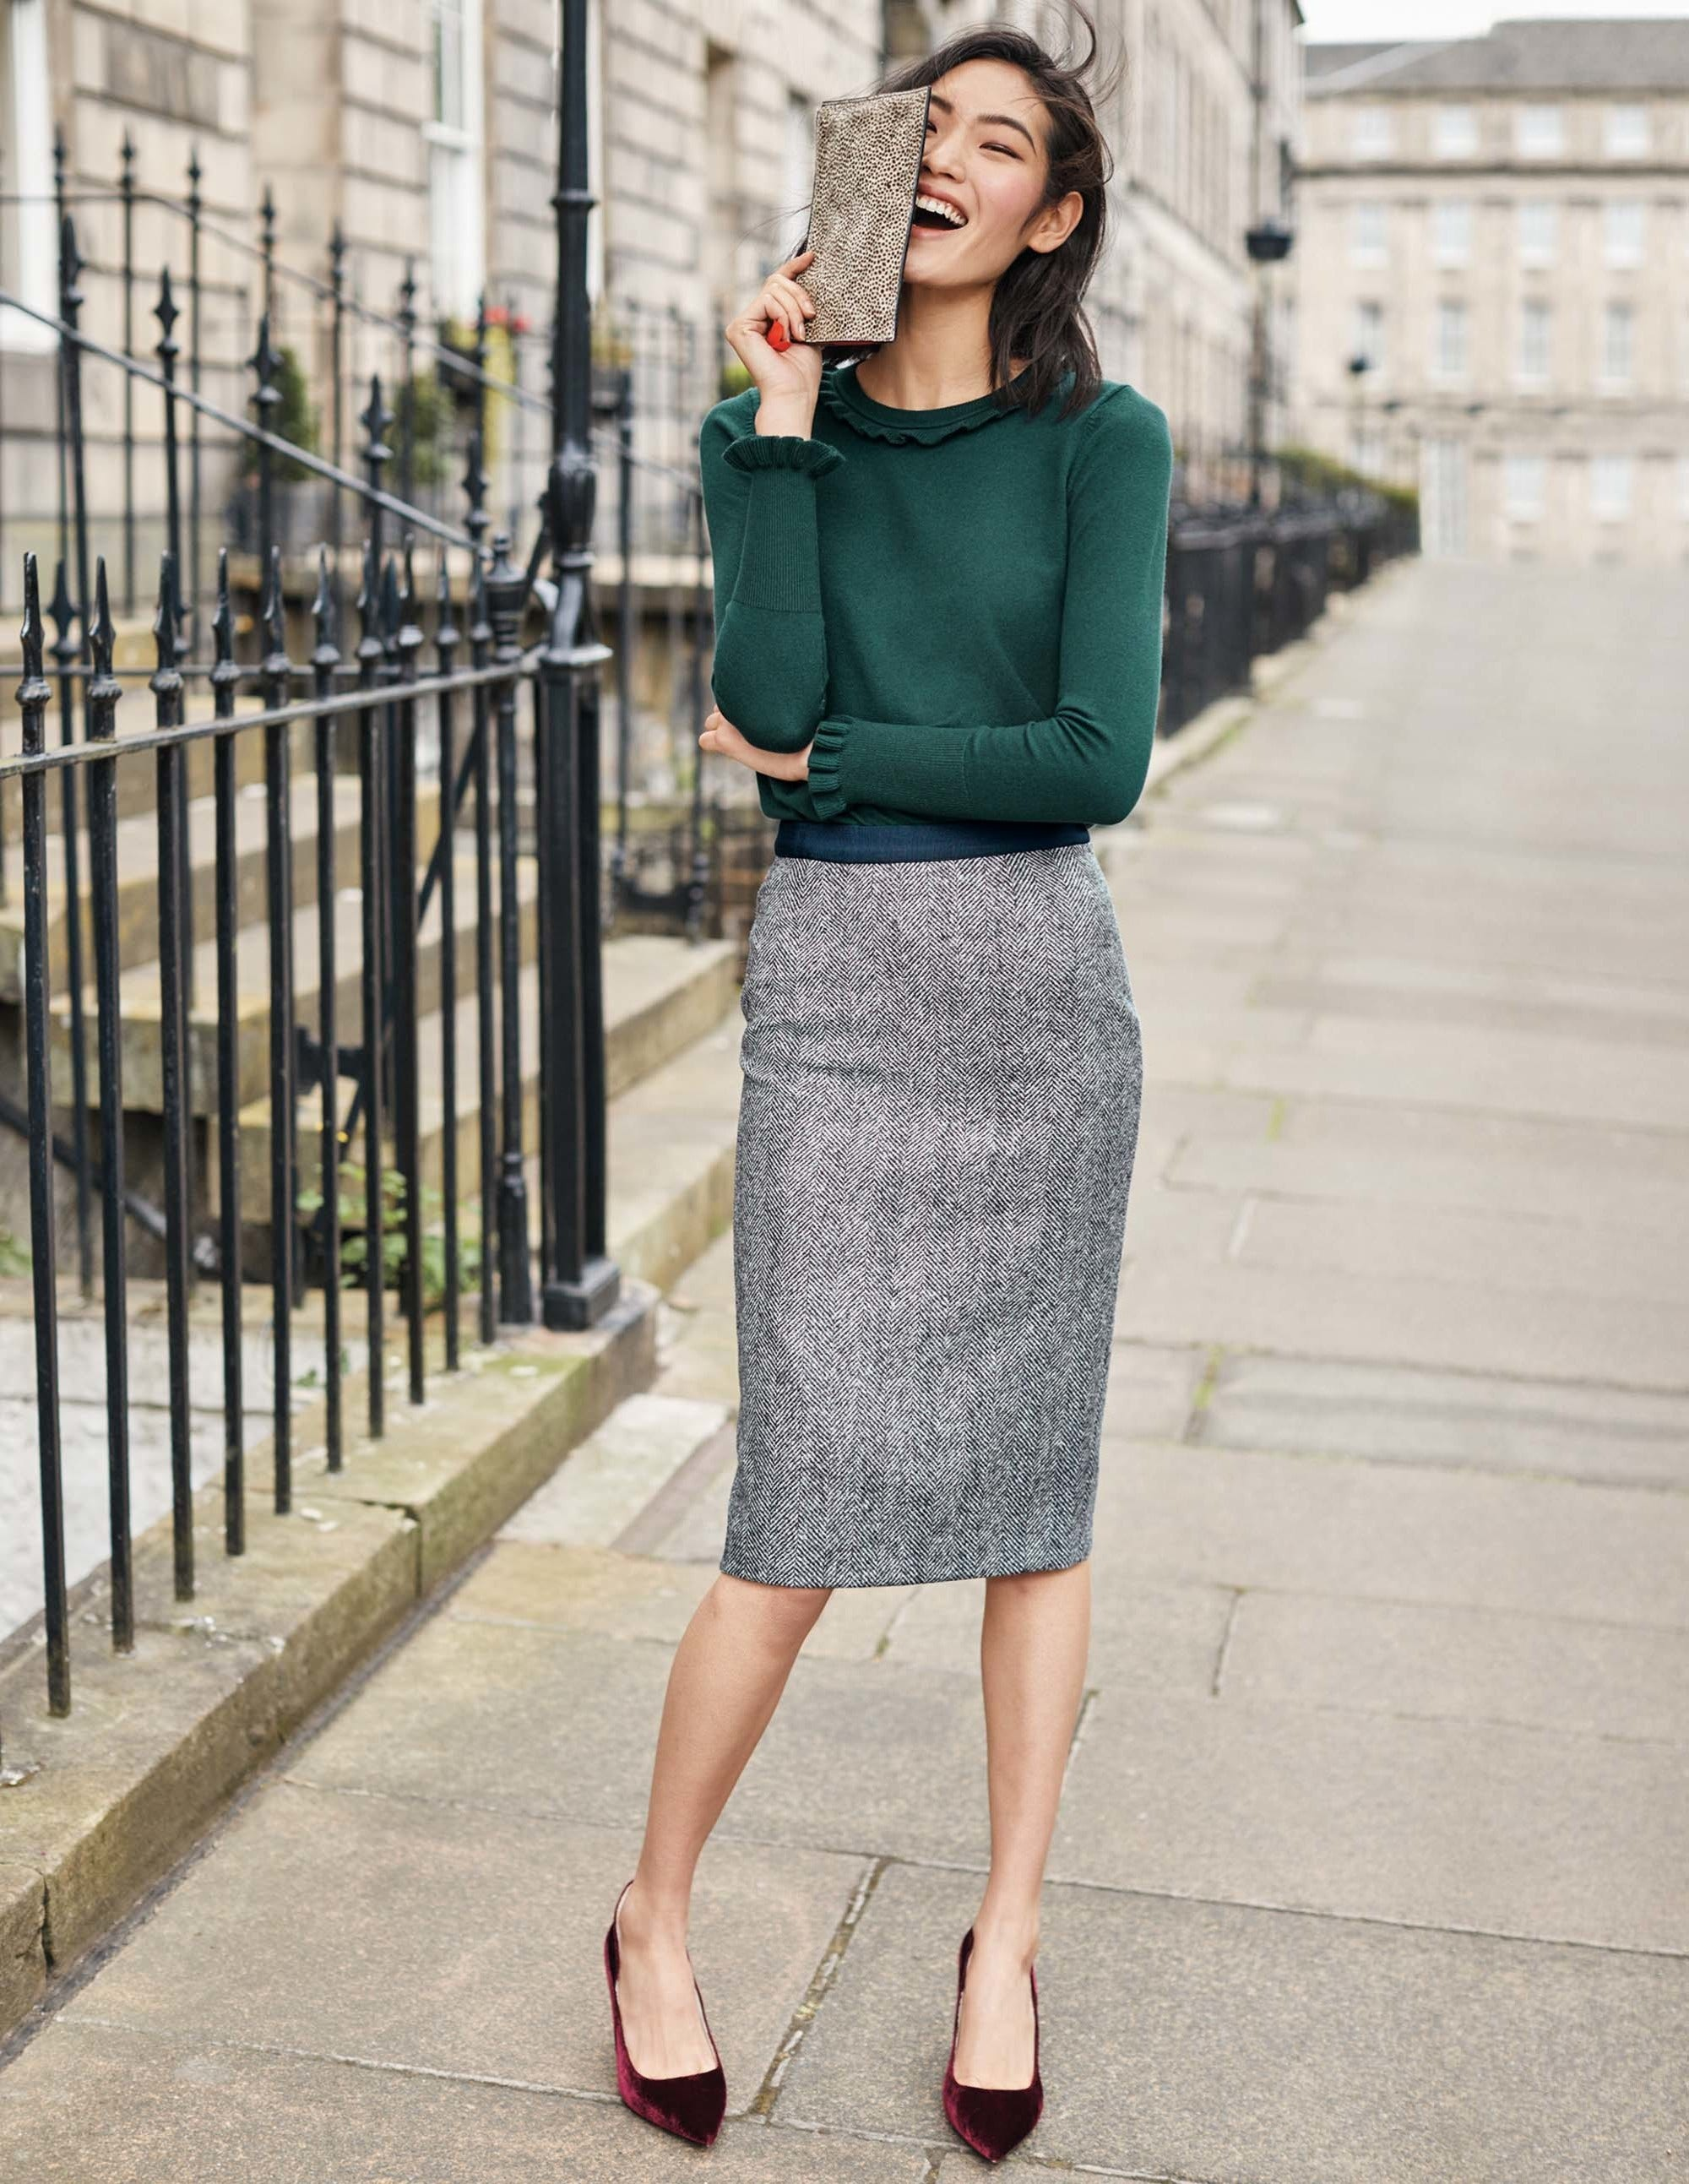 78bdef23d British Tweed Pencil Skirt - Navy and Ivory Herringbone | Boden US